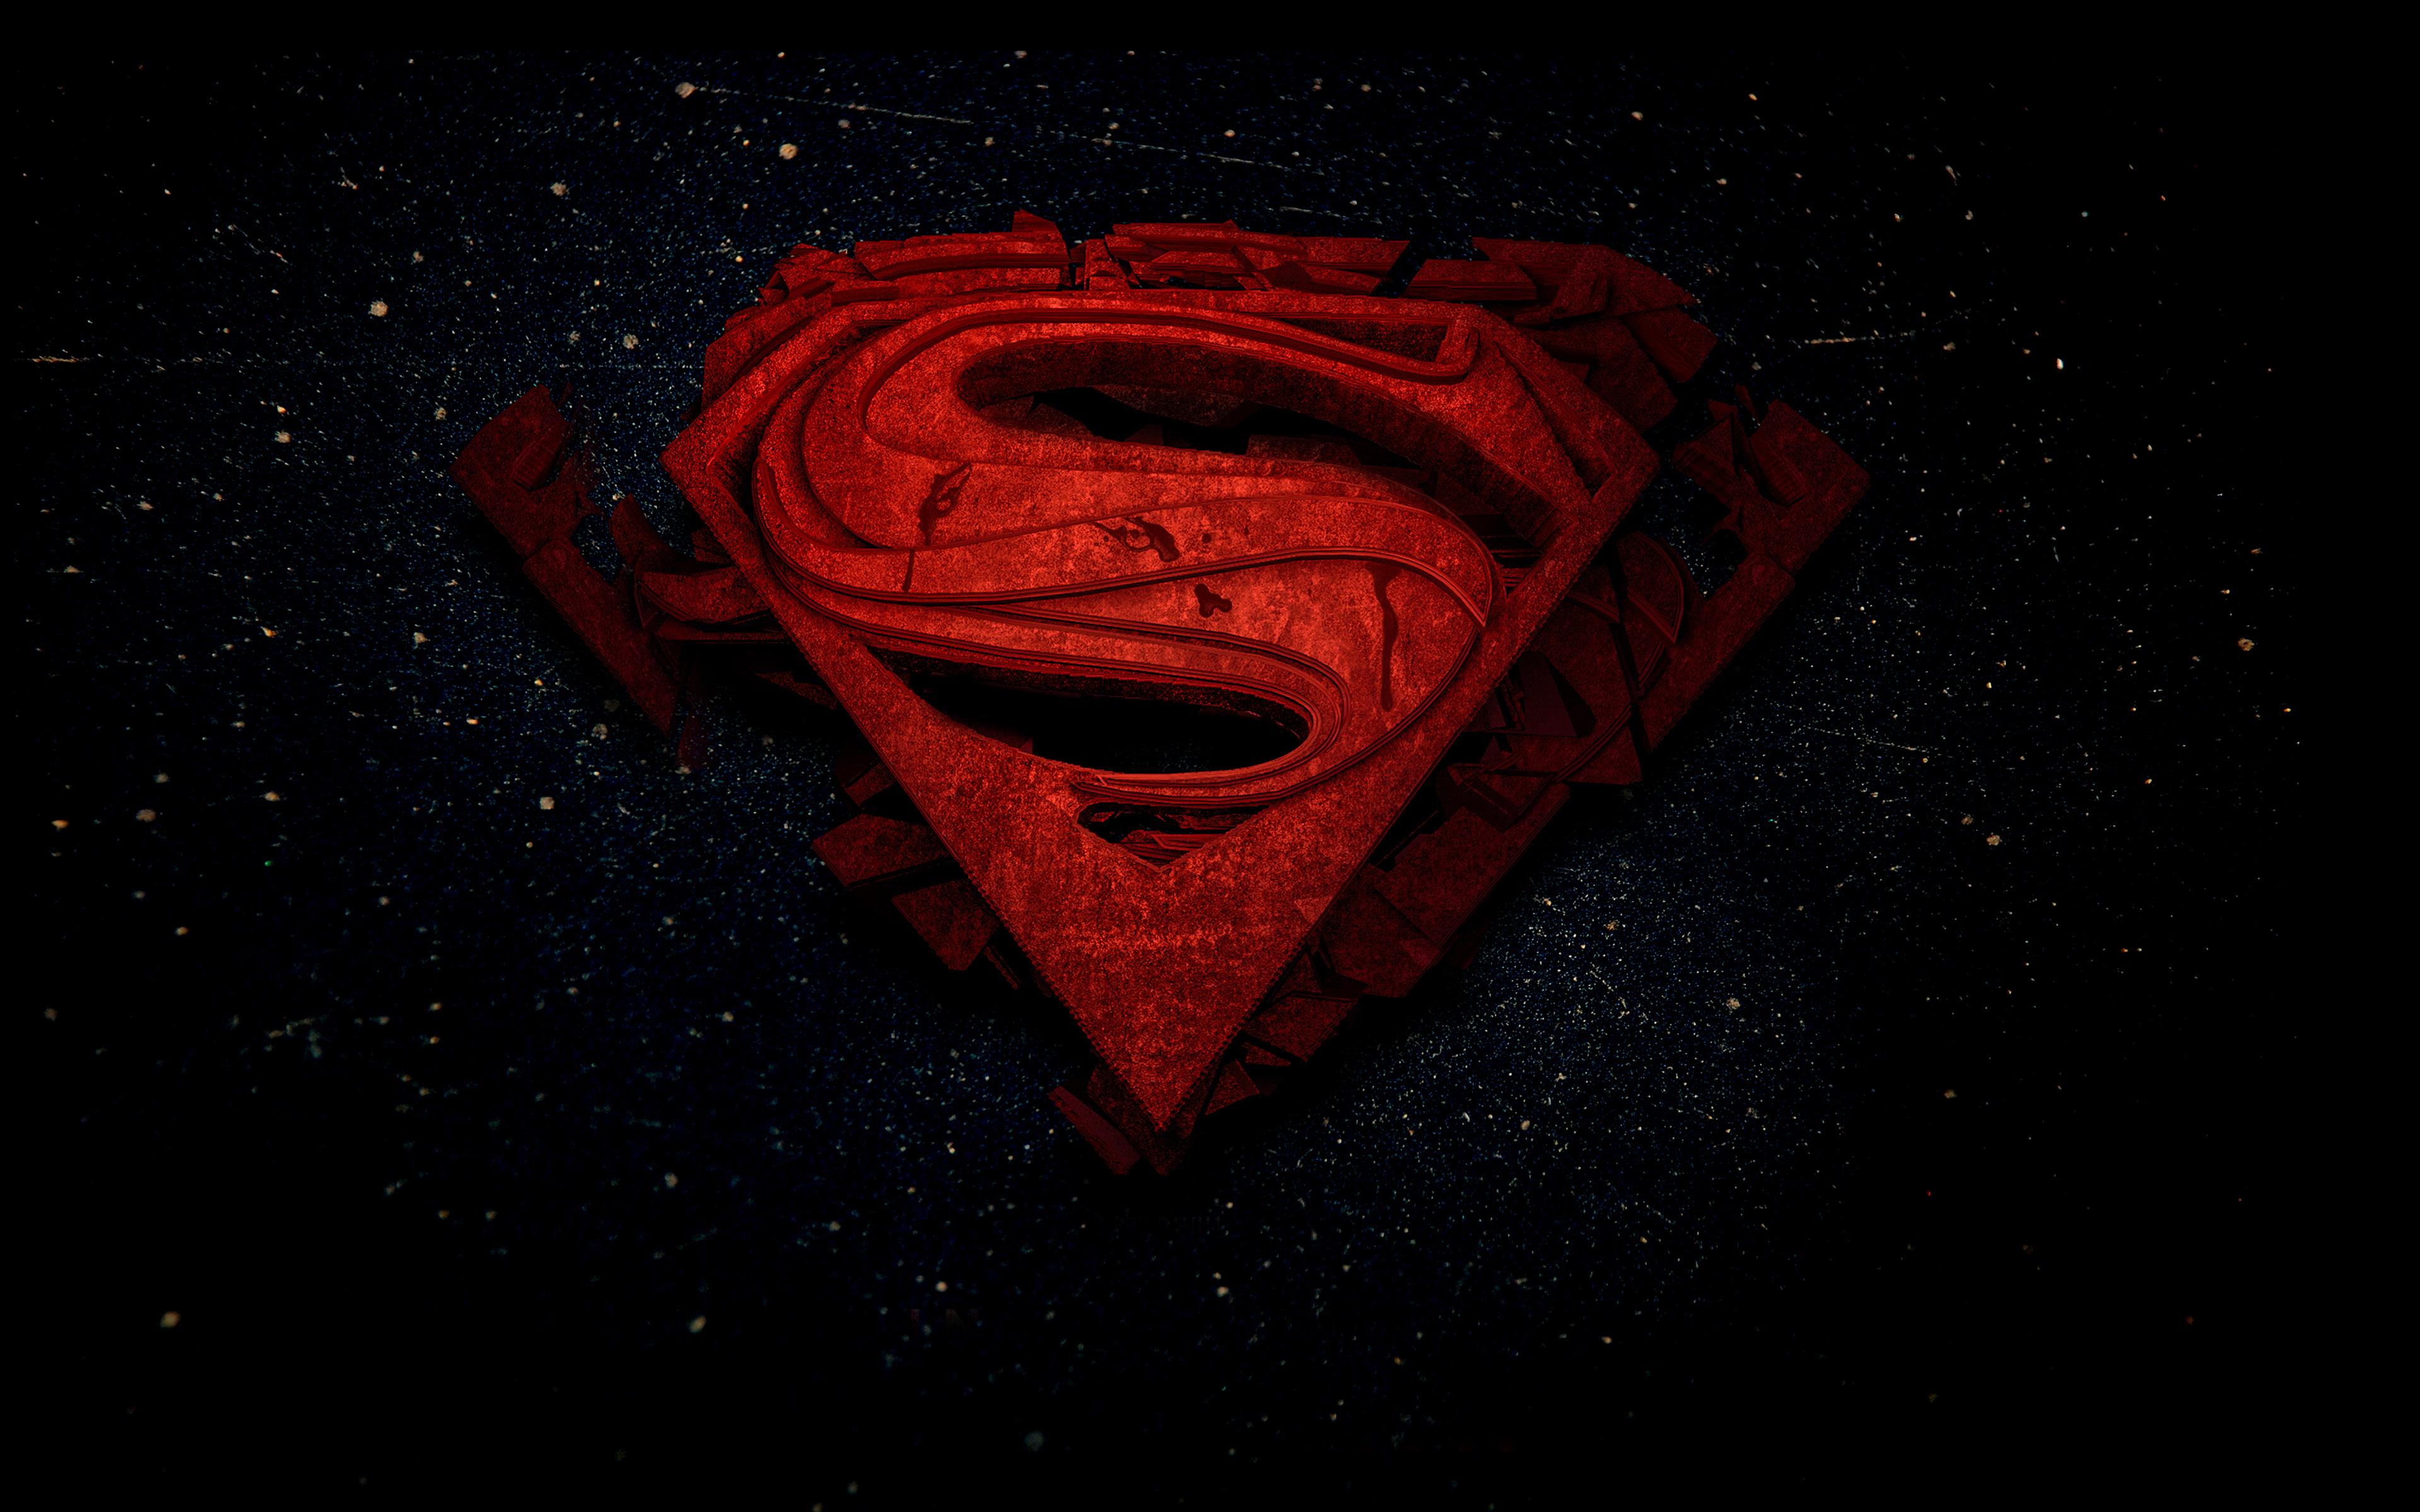 Superman 4k Space 3d Logo Superheroes Dc Comics Superman 4k Wallpaper For Mobile 2142286 Hd Wallpaper Backgrounds Download